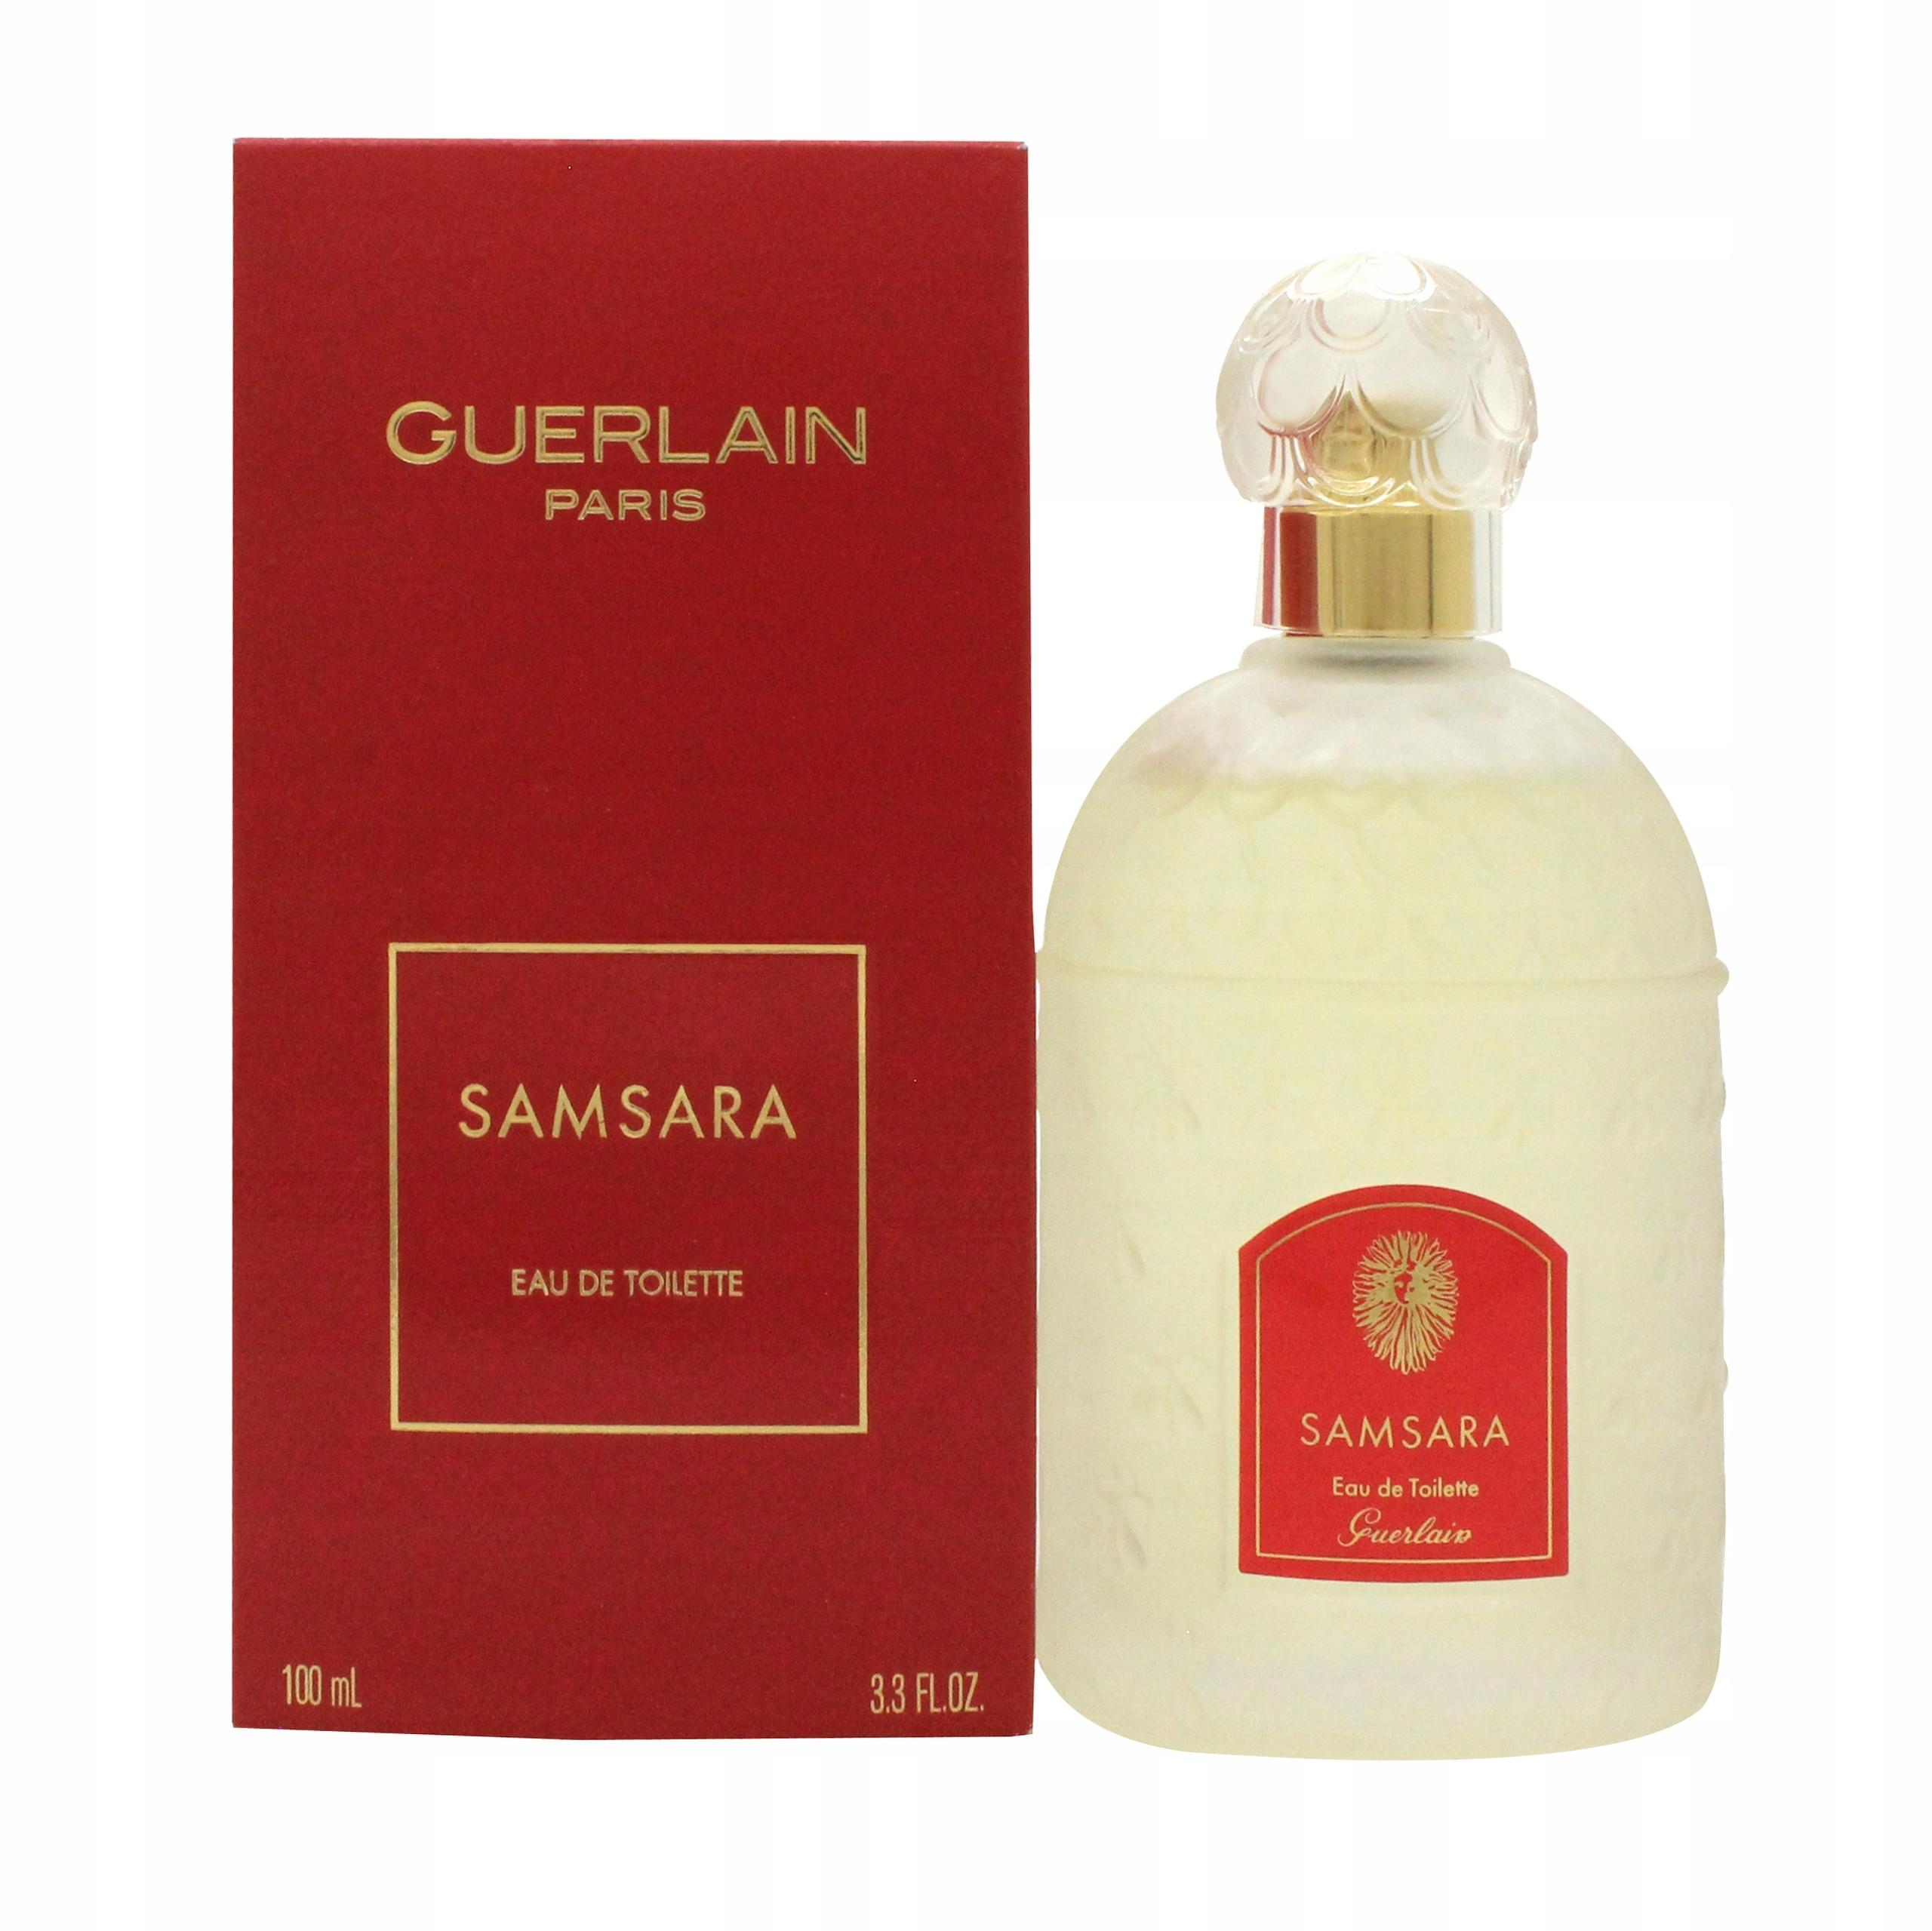 Guerlain Samsara Eau de Toilette 100ml Spray 7855858946